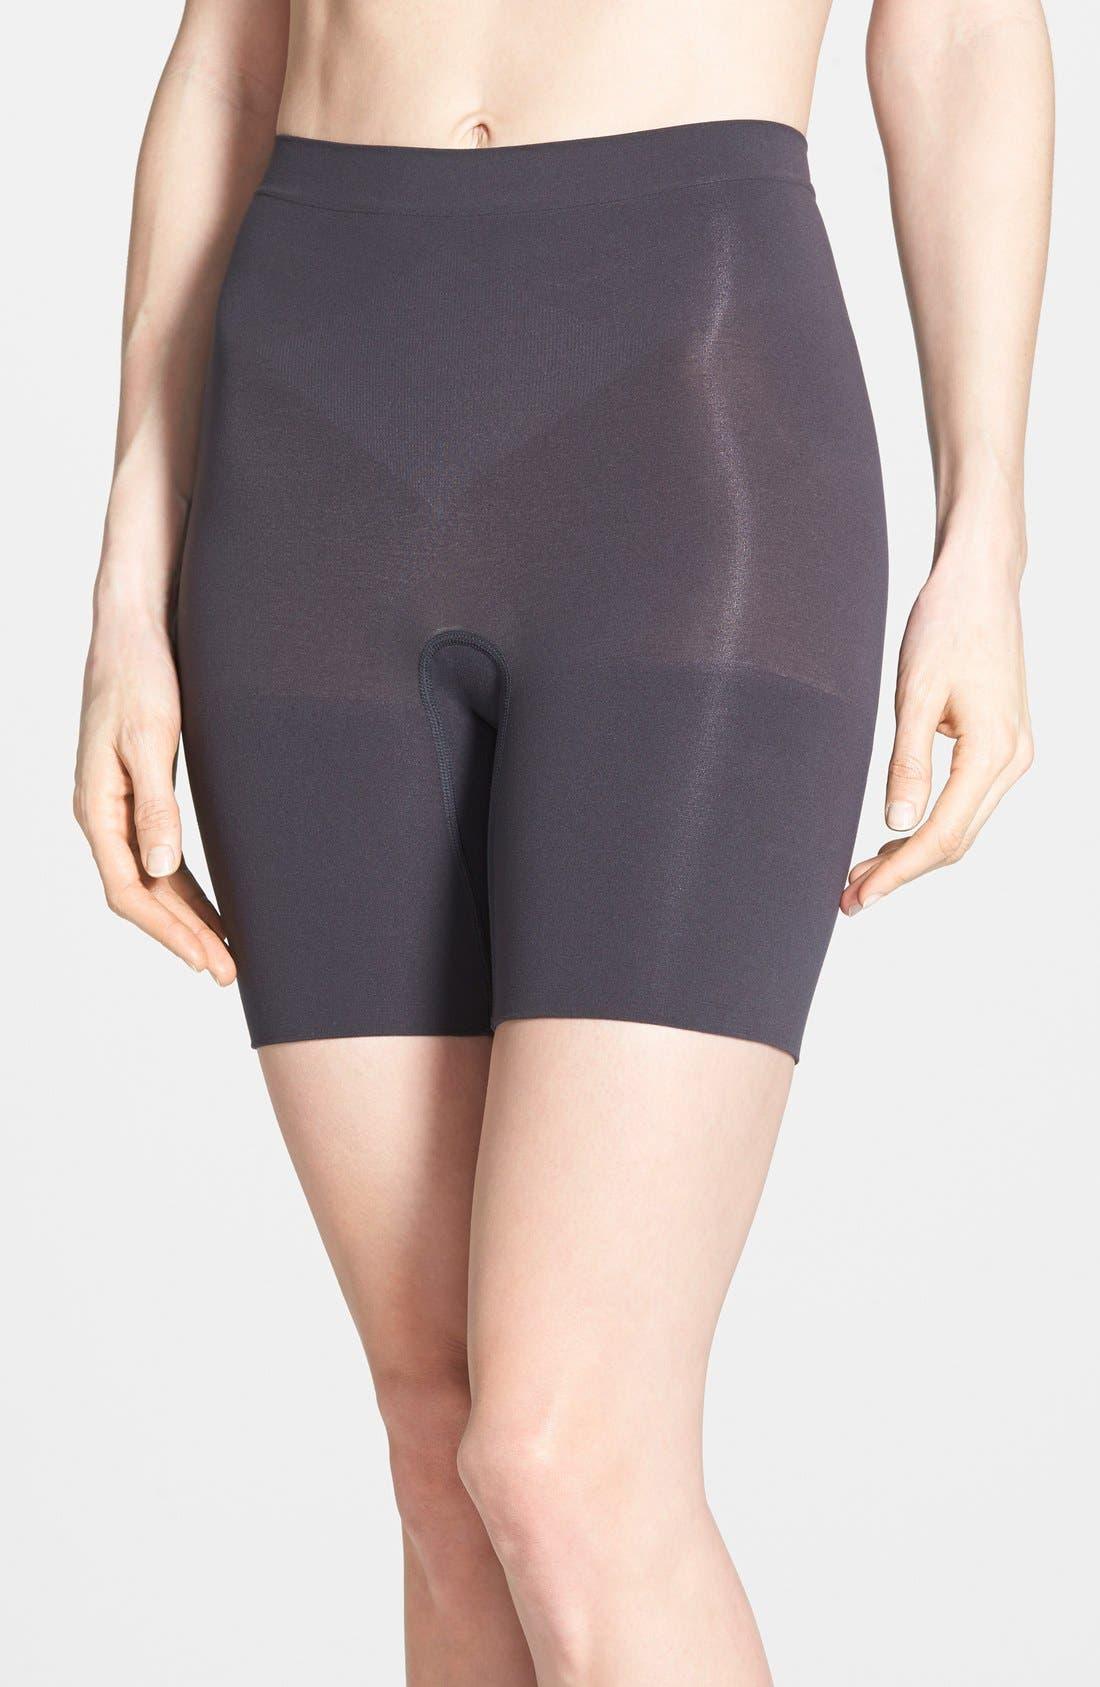 Main Image - SPANX® Power Short Mid Thigh Shaper (Regular & Plus Size)